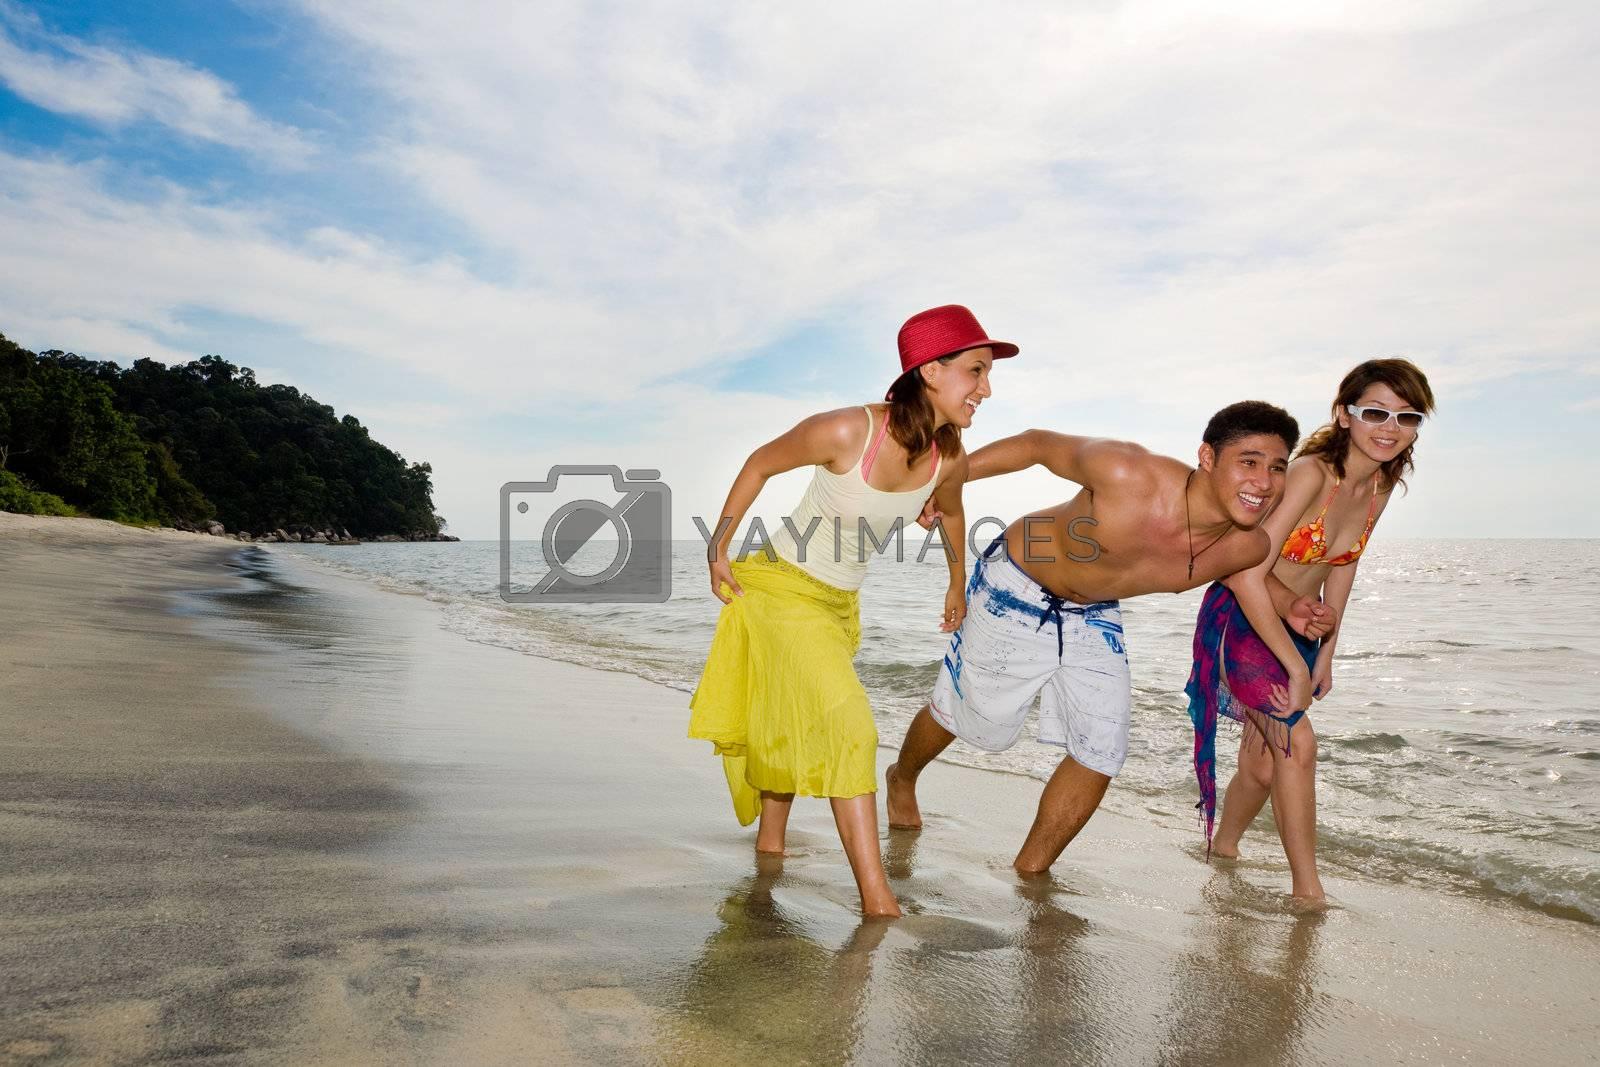 friends having fun on the beach by eyedear